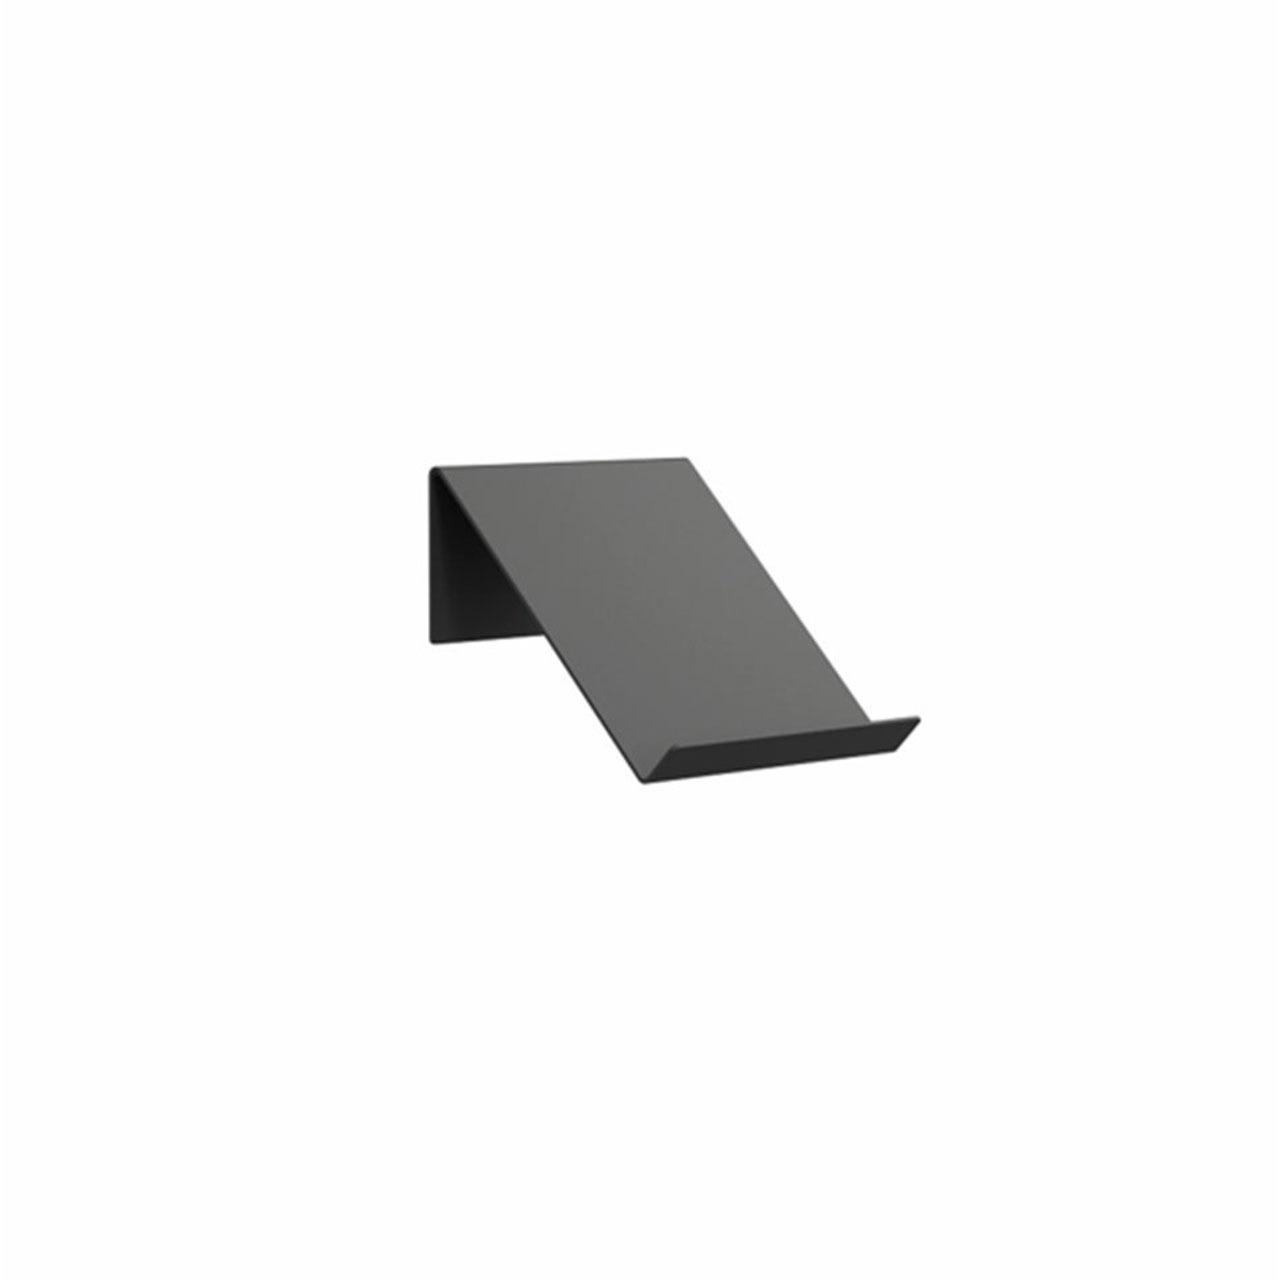 Frost Schuh-/Magazinregal   Matt schwarz,  30 cm